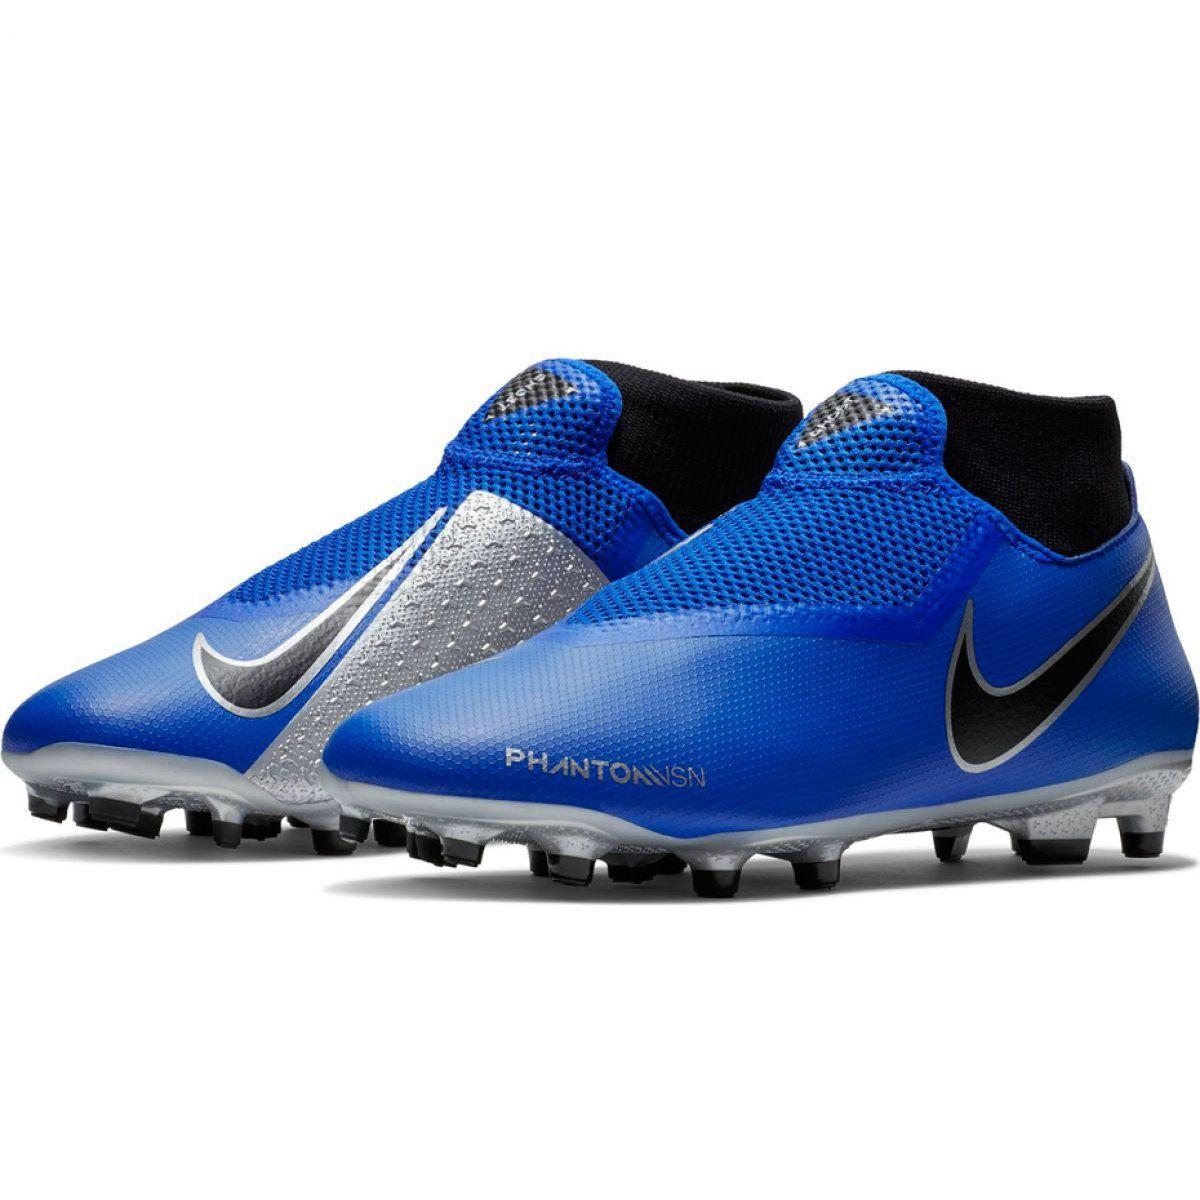 Buty Pilkarskie Nike Phantom Vsn Academy Df Fg Mg M Ao3258 400 Niebieskie Wielokolorowe Football Shoes Nike Blue Shoes